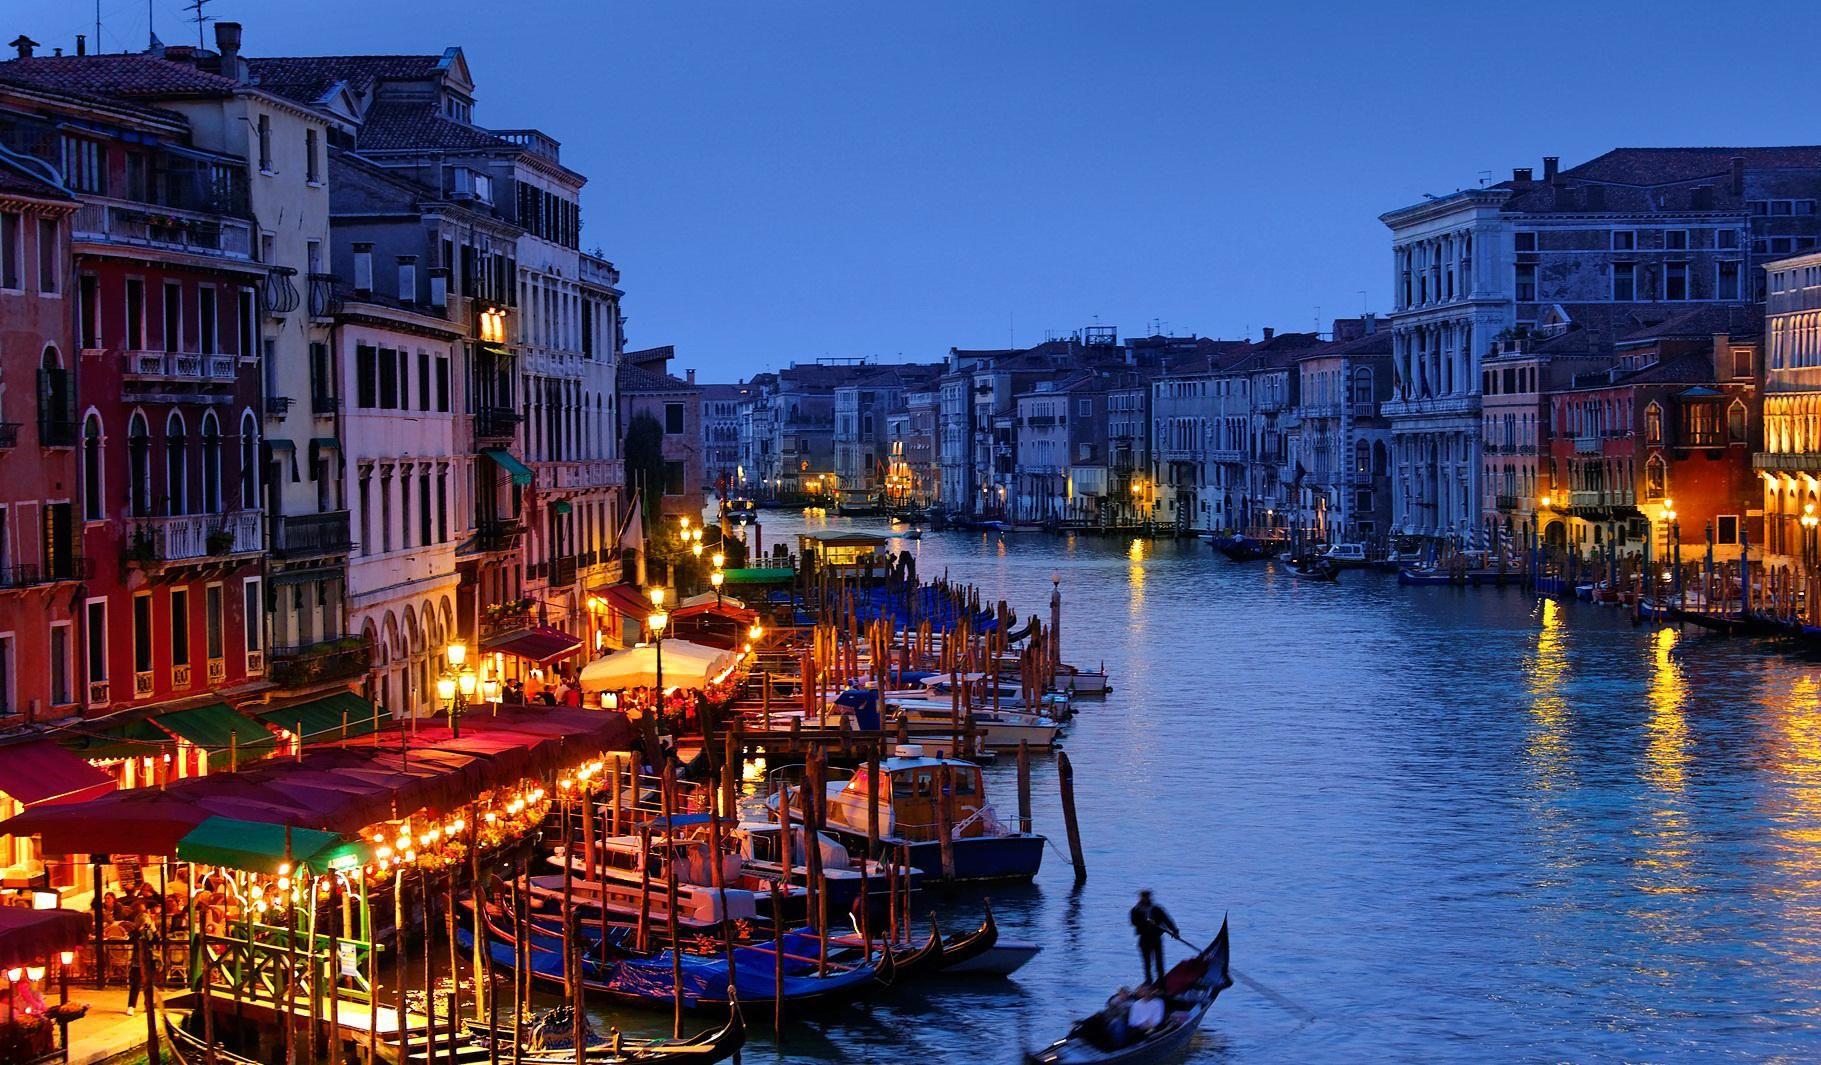 Pin by Ina Gussi on Venice in 2019 Venice italy Venice Venice 1821x1065